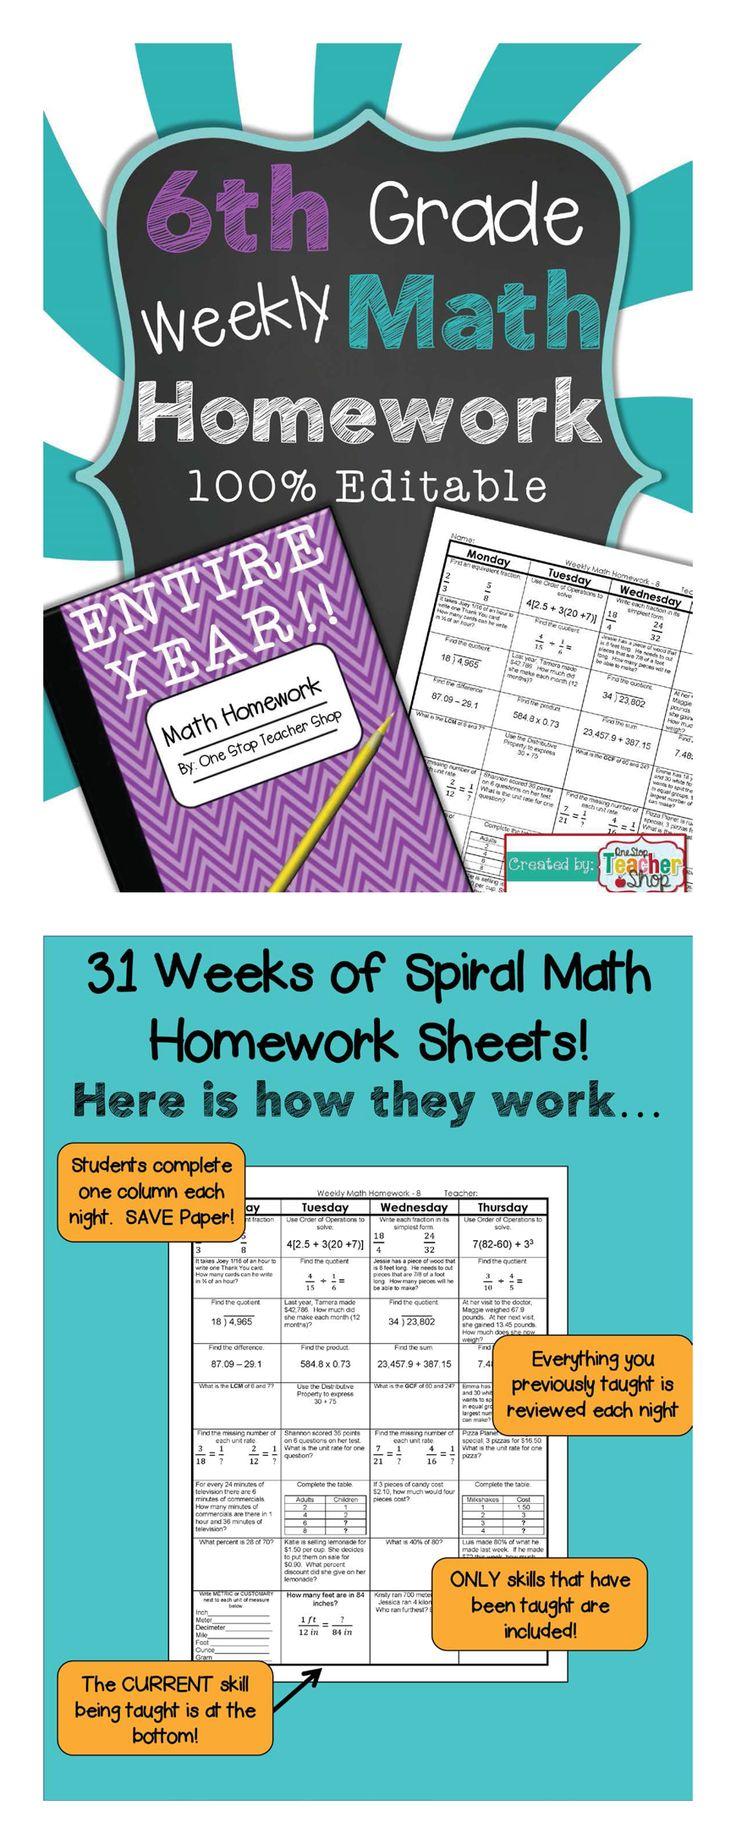 6th Grade Common Core Spiral Math Homework - ENTIRE YEAR!!! 100% Editable, w/ Answer Keys! $